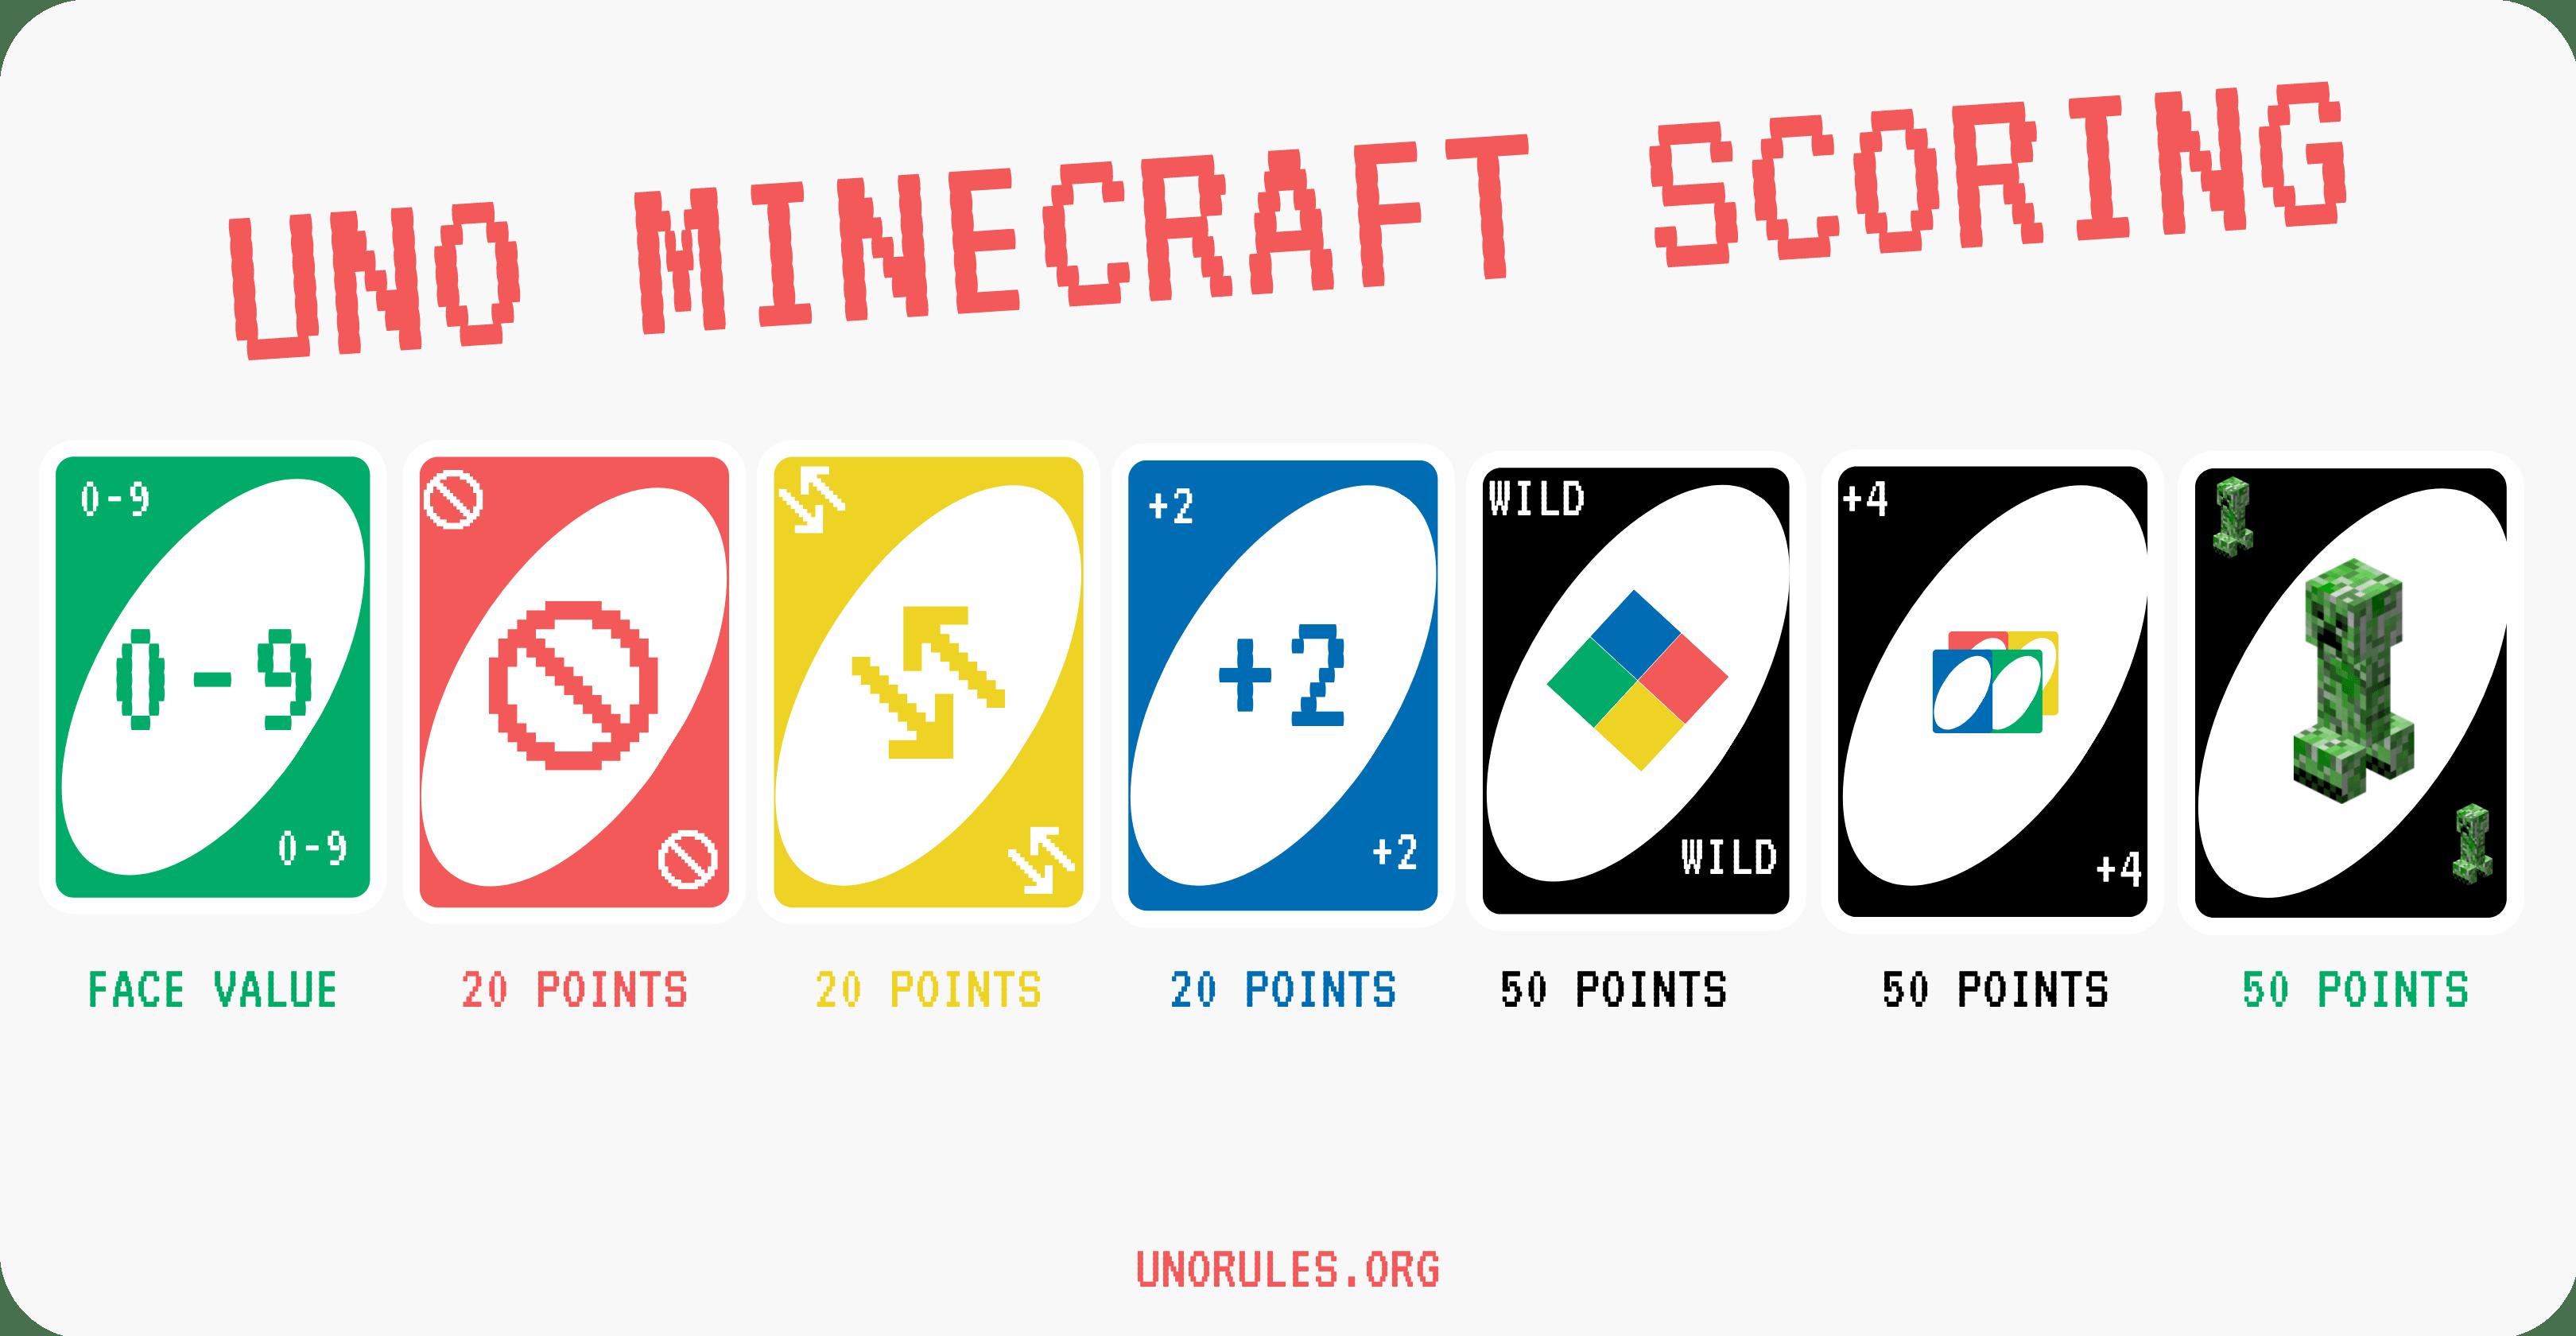 Uno Minecraft rules scoring